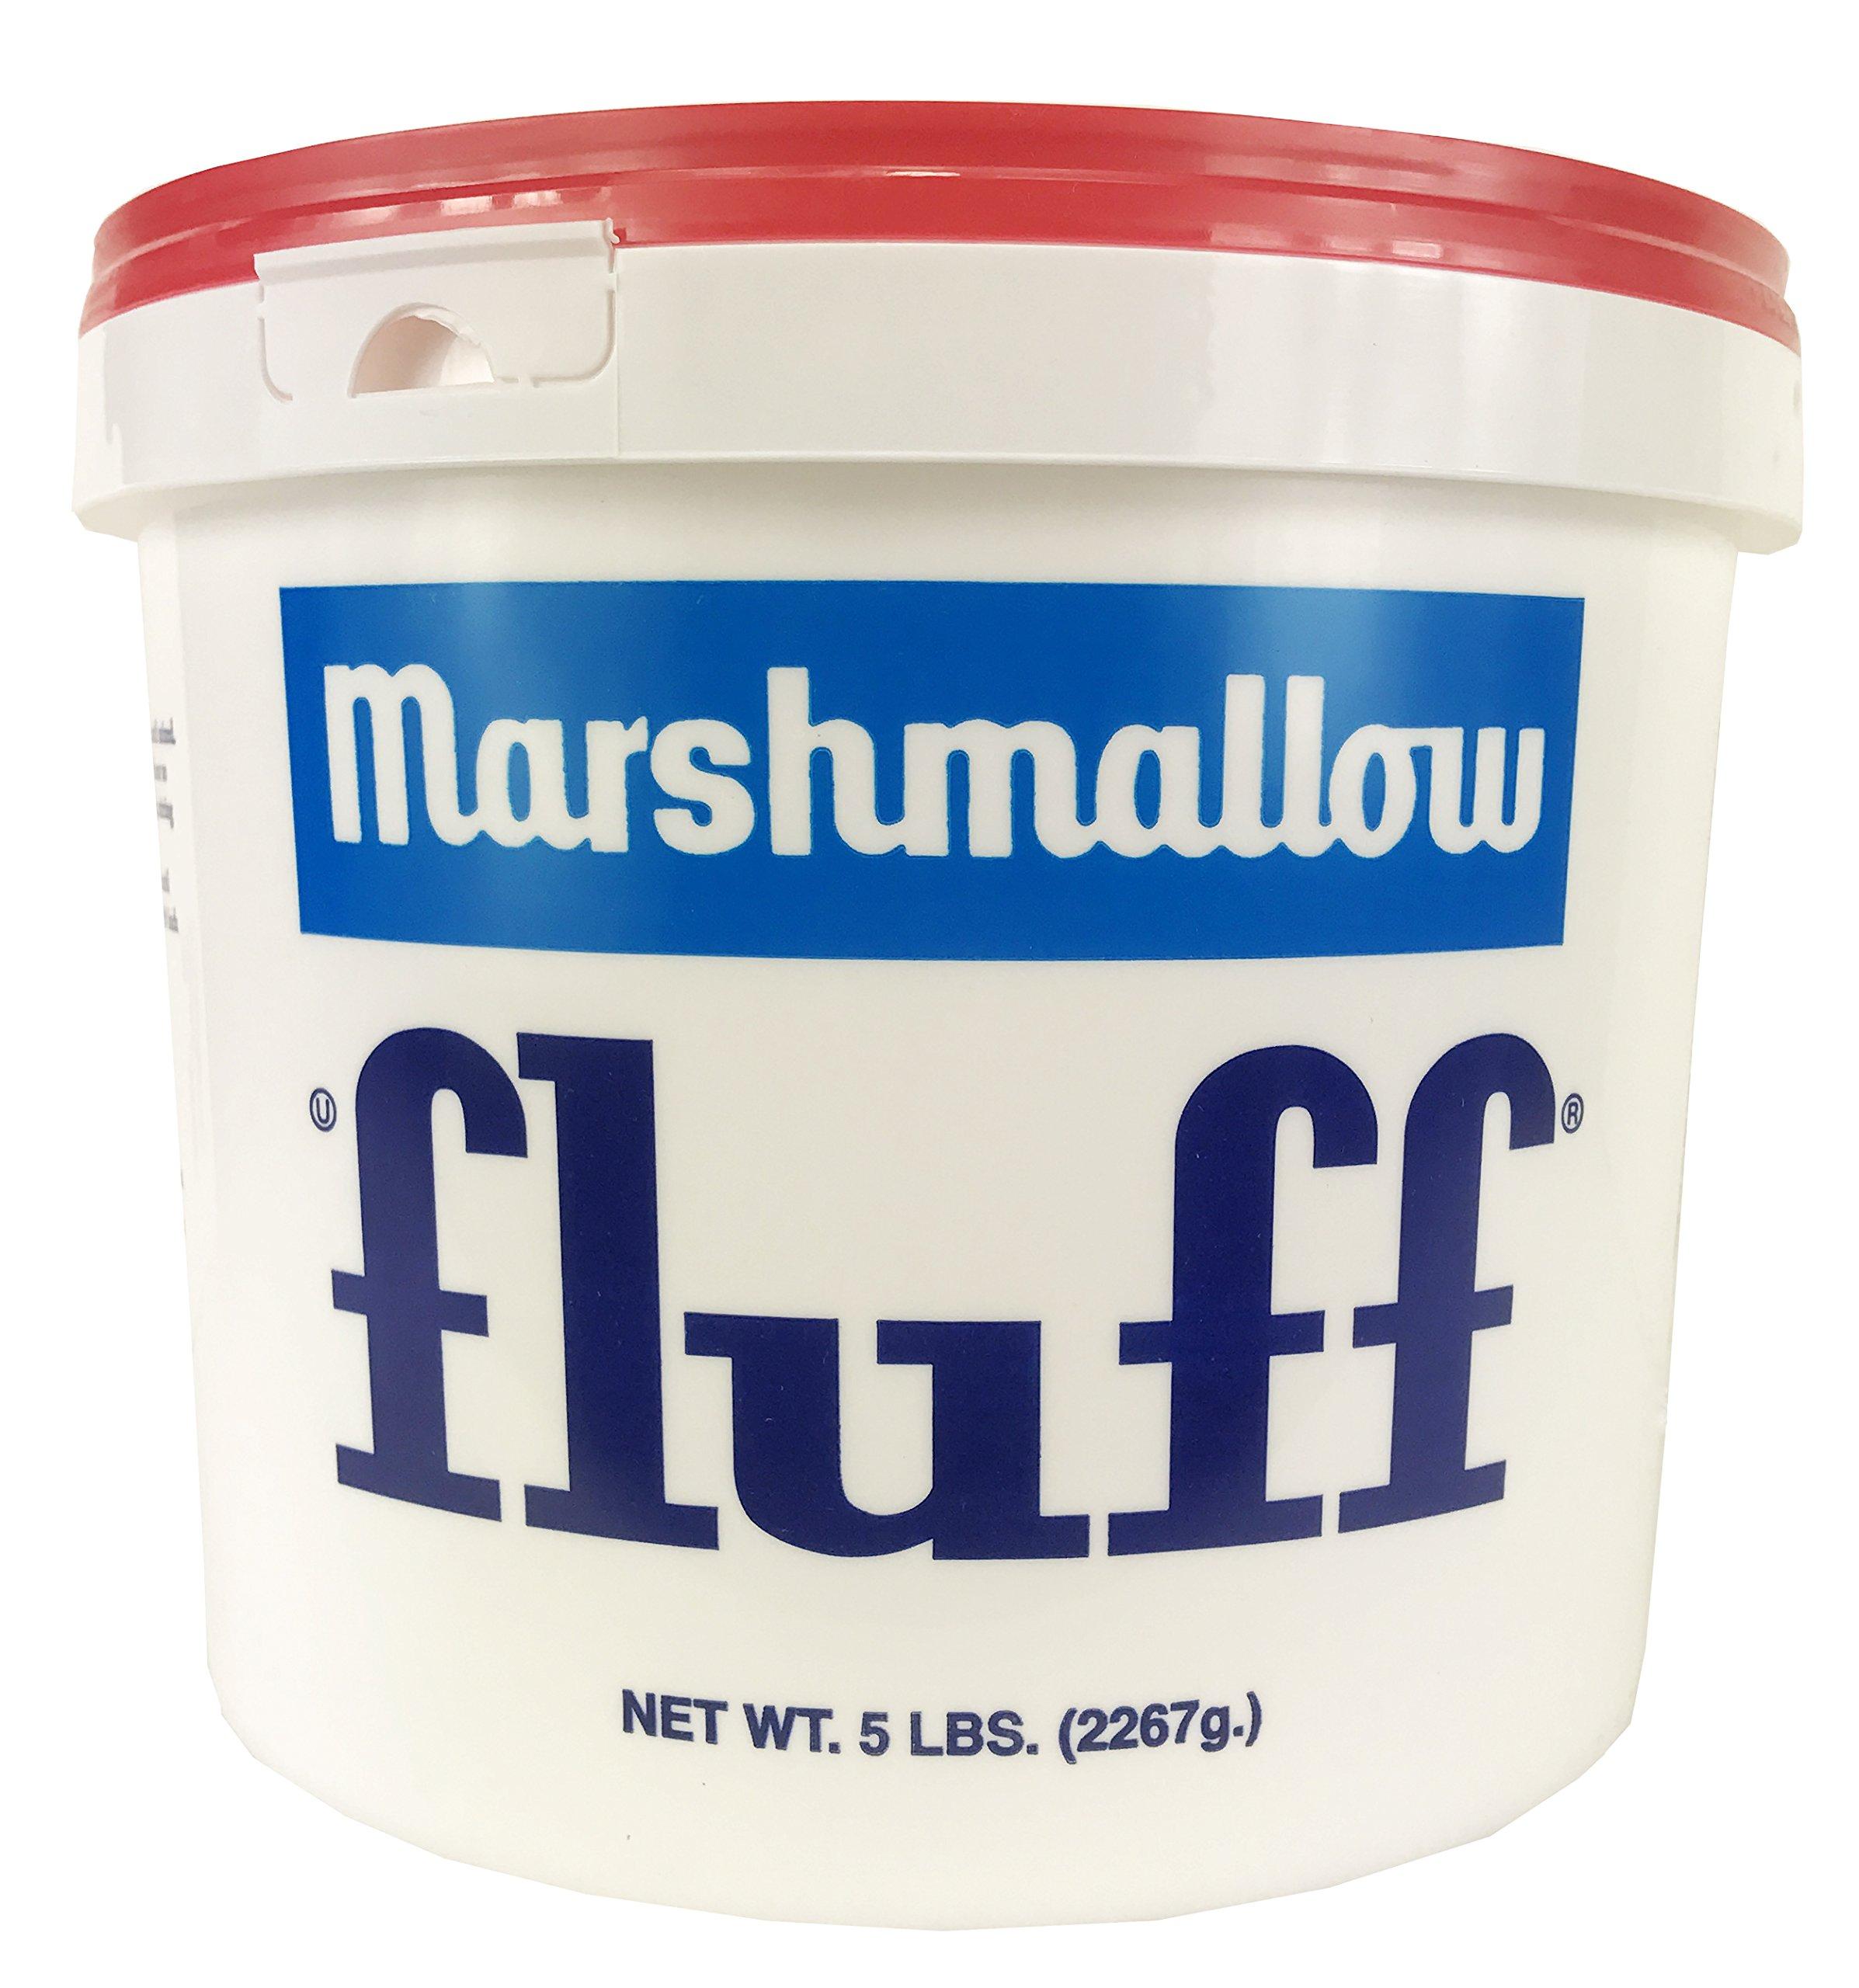 Bathroom Diorama Made Of Cereal Box Margarine Tub And: Amazon.com : Marshmallow Fluff Original Marshmallow Fluff